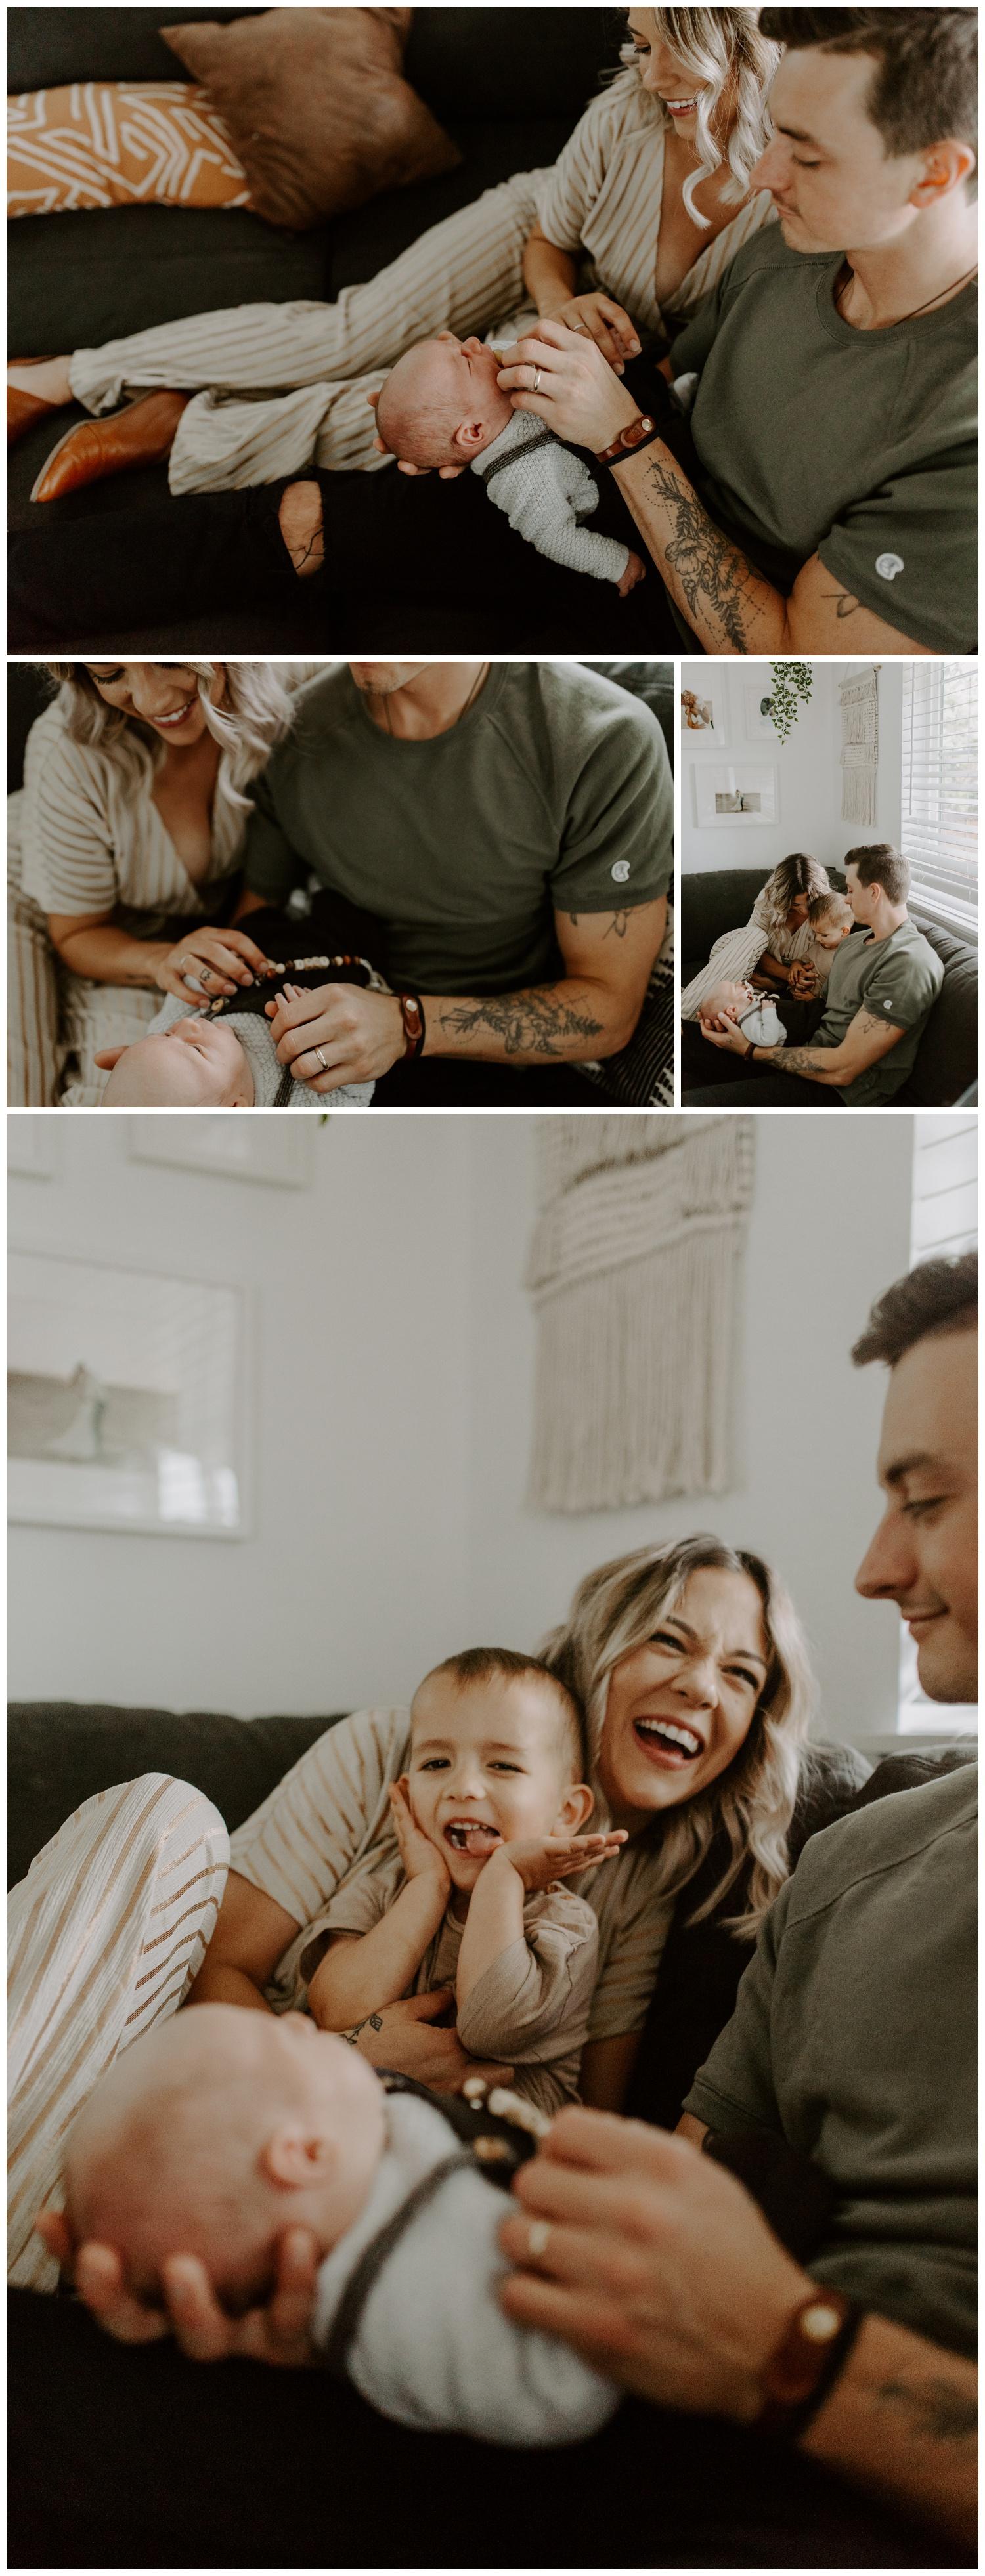 In Home newbordn Session | Washington Lifestyle Family Photographer Jessica Heron Images | jessicaheronimages.com | Newborns with siblingA.JPG